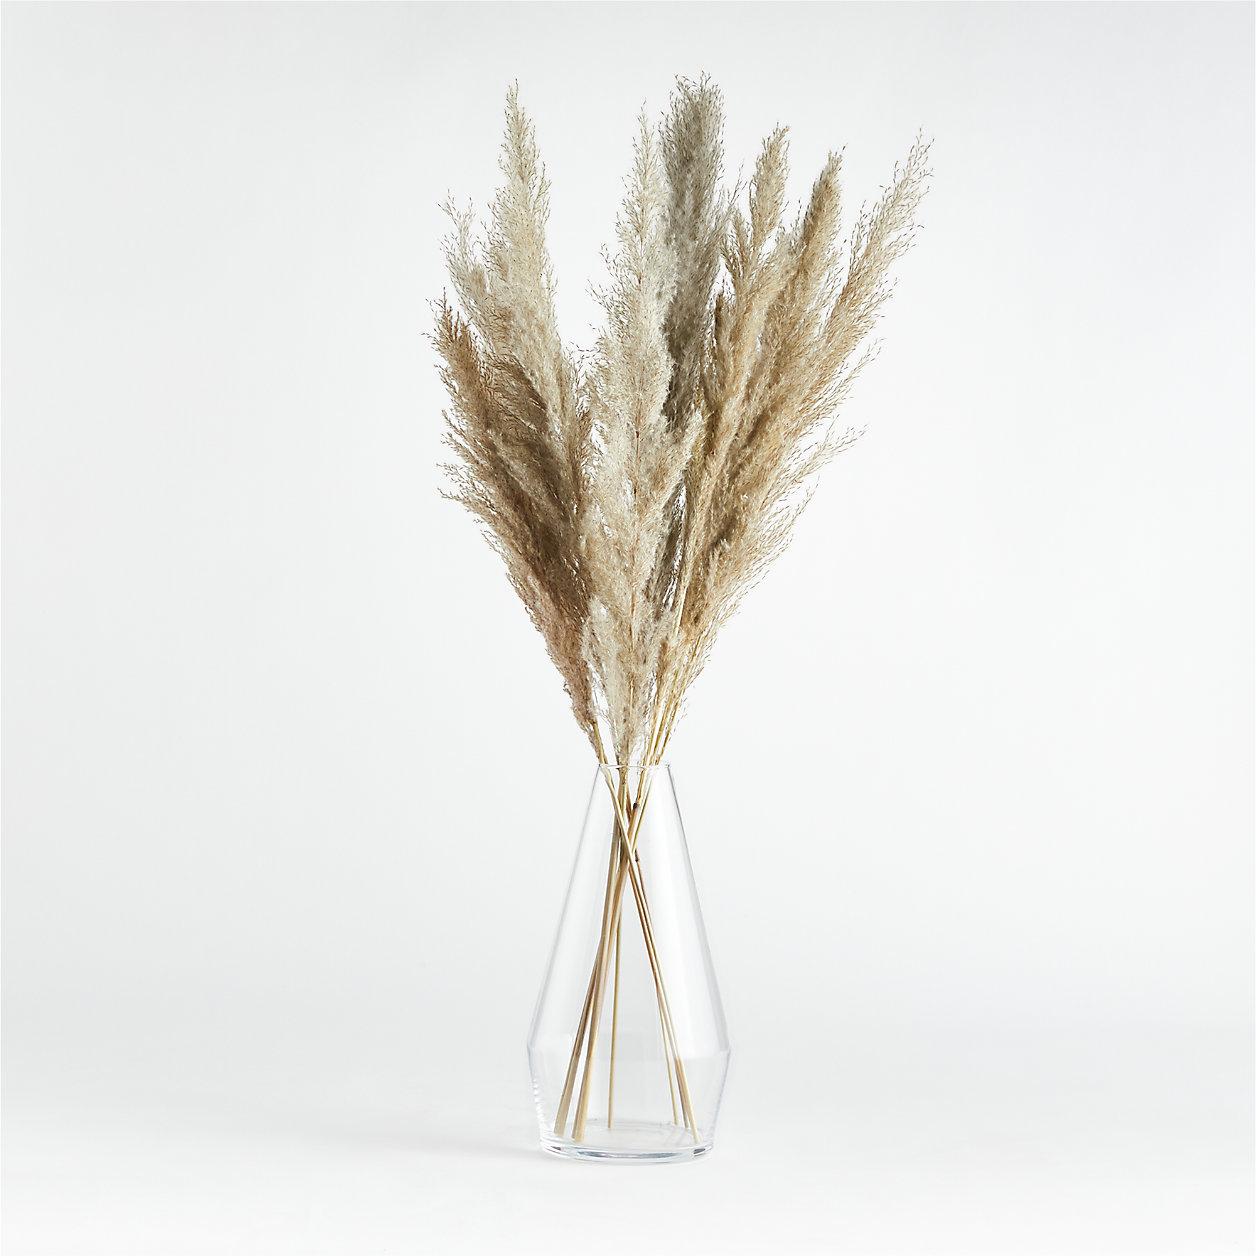 Dried Grass Plume